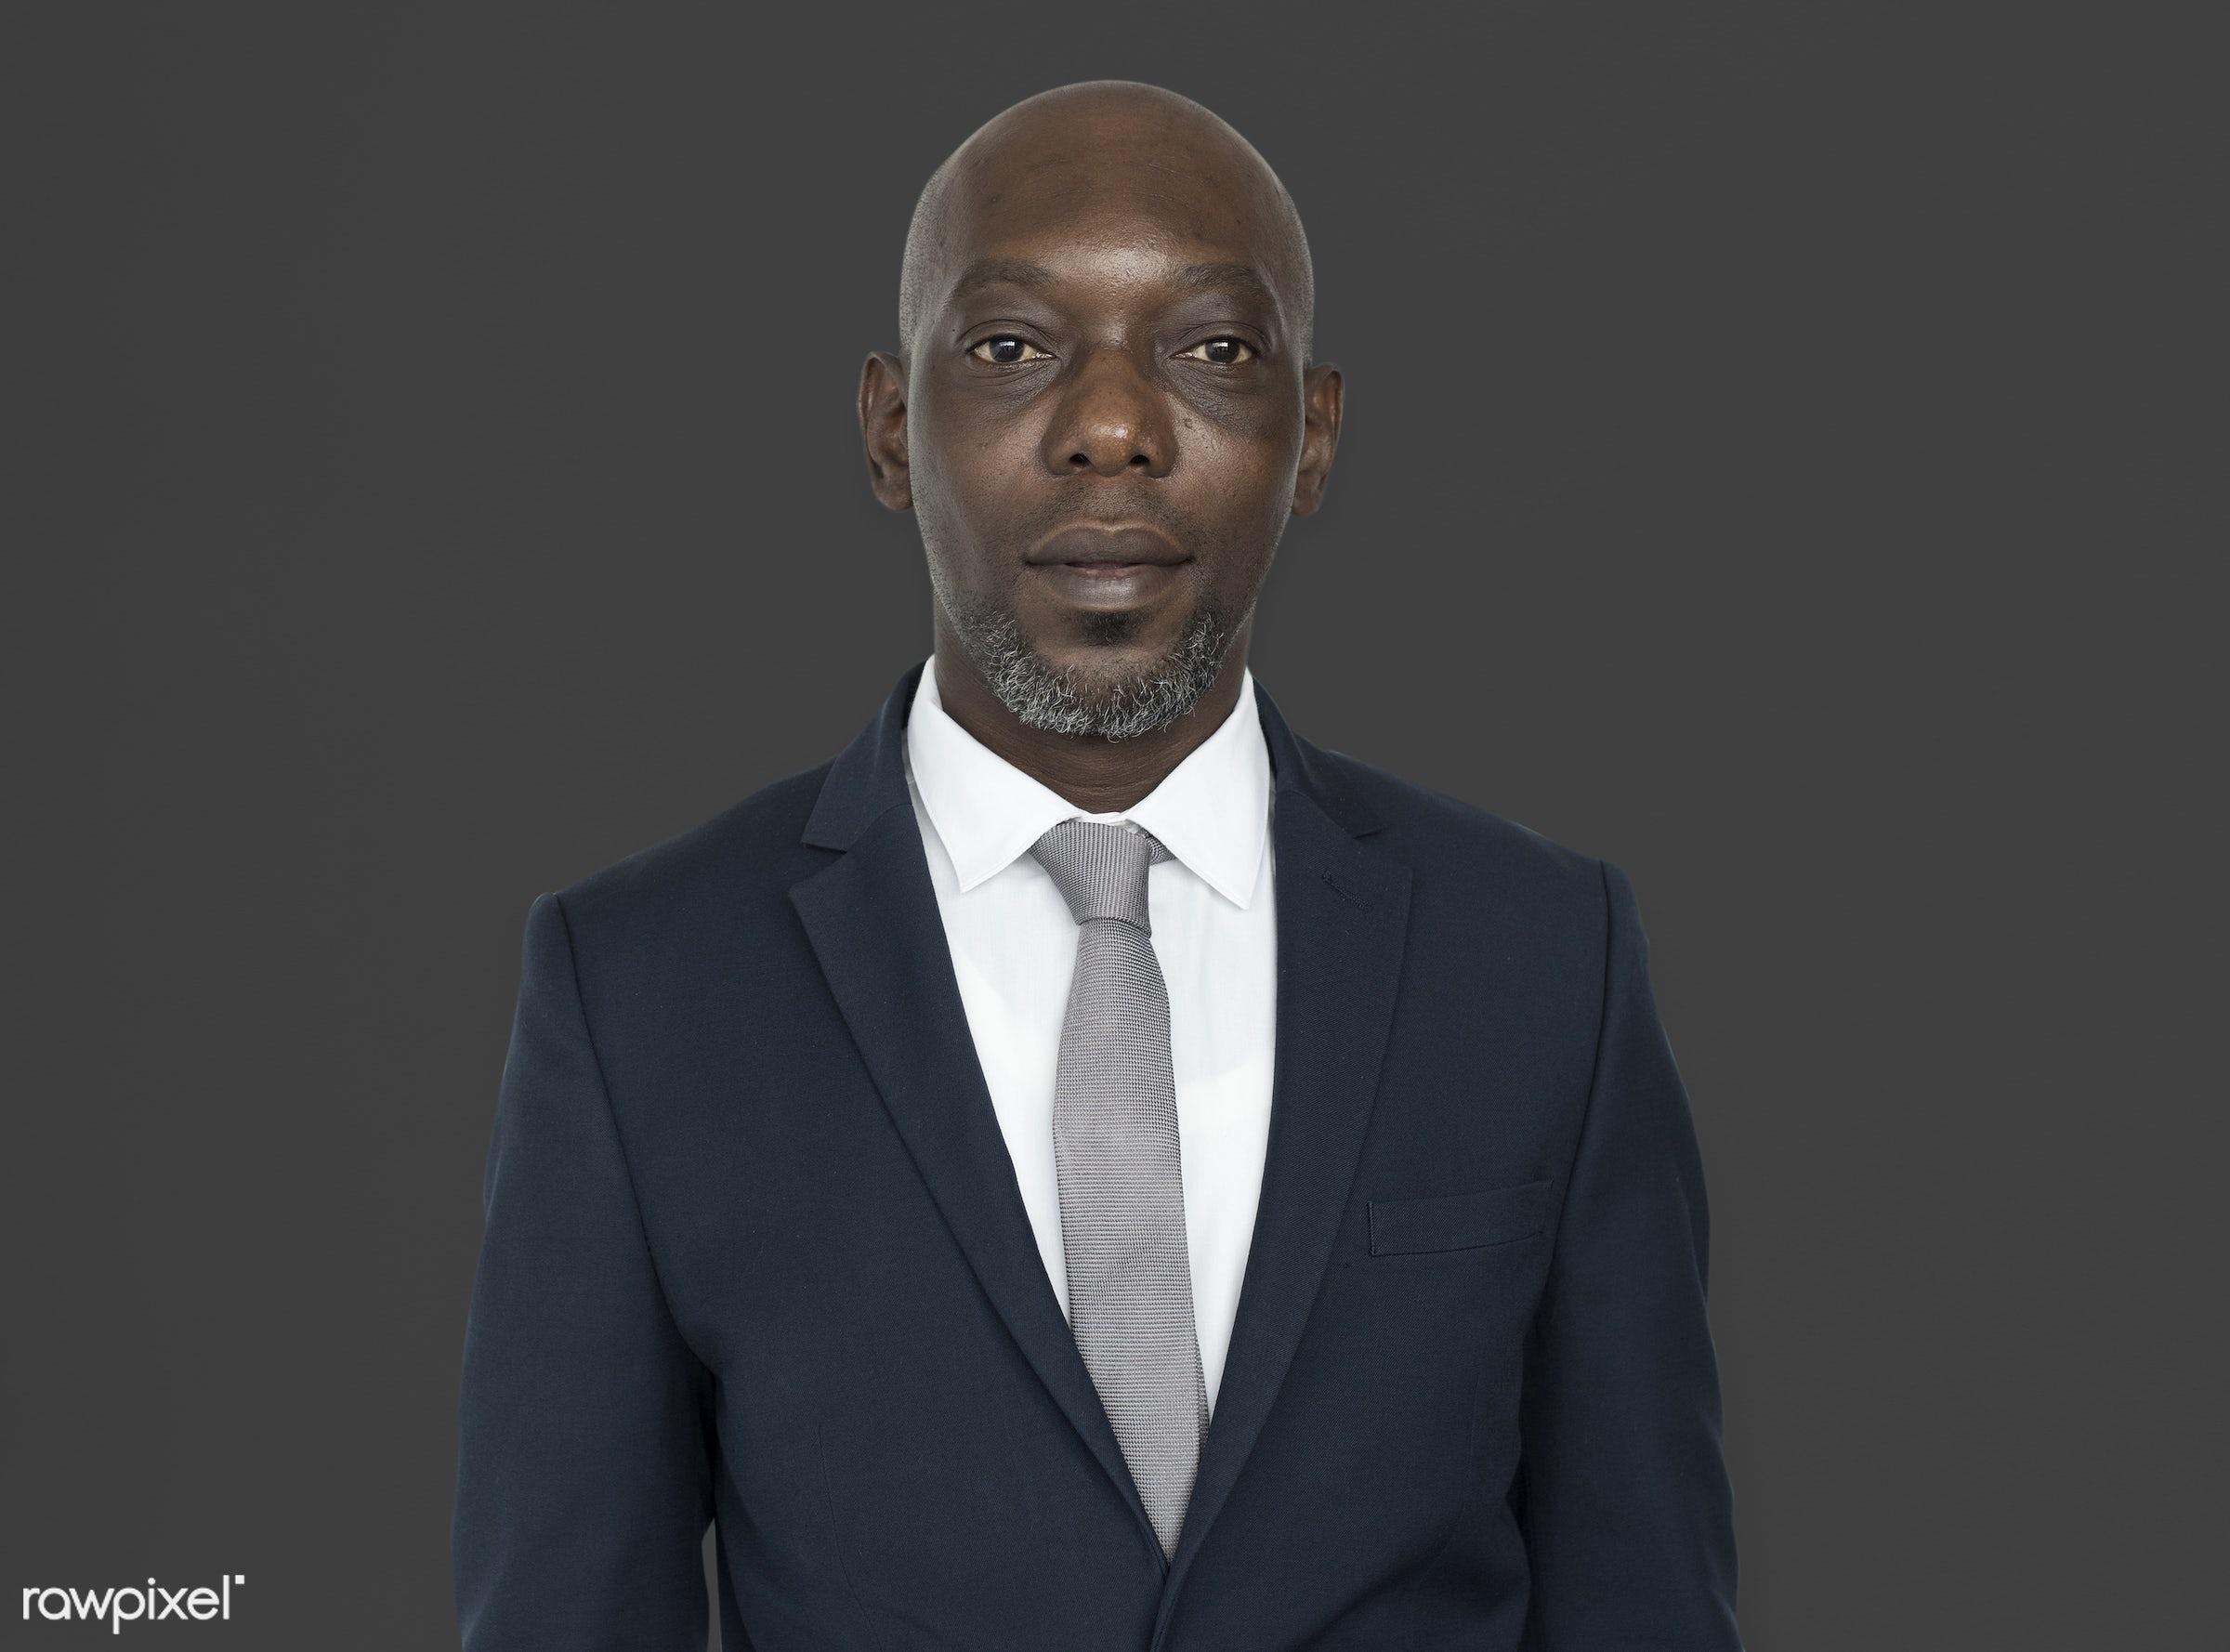 black, african, man, african american, portrait, suit, tie, professional, start up, business